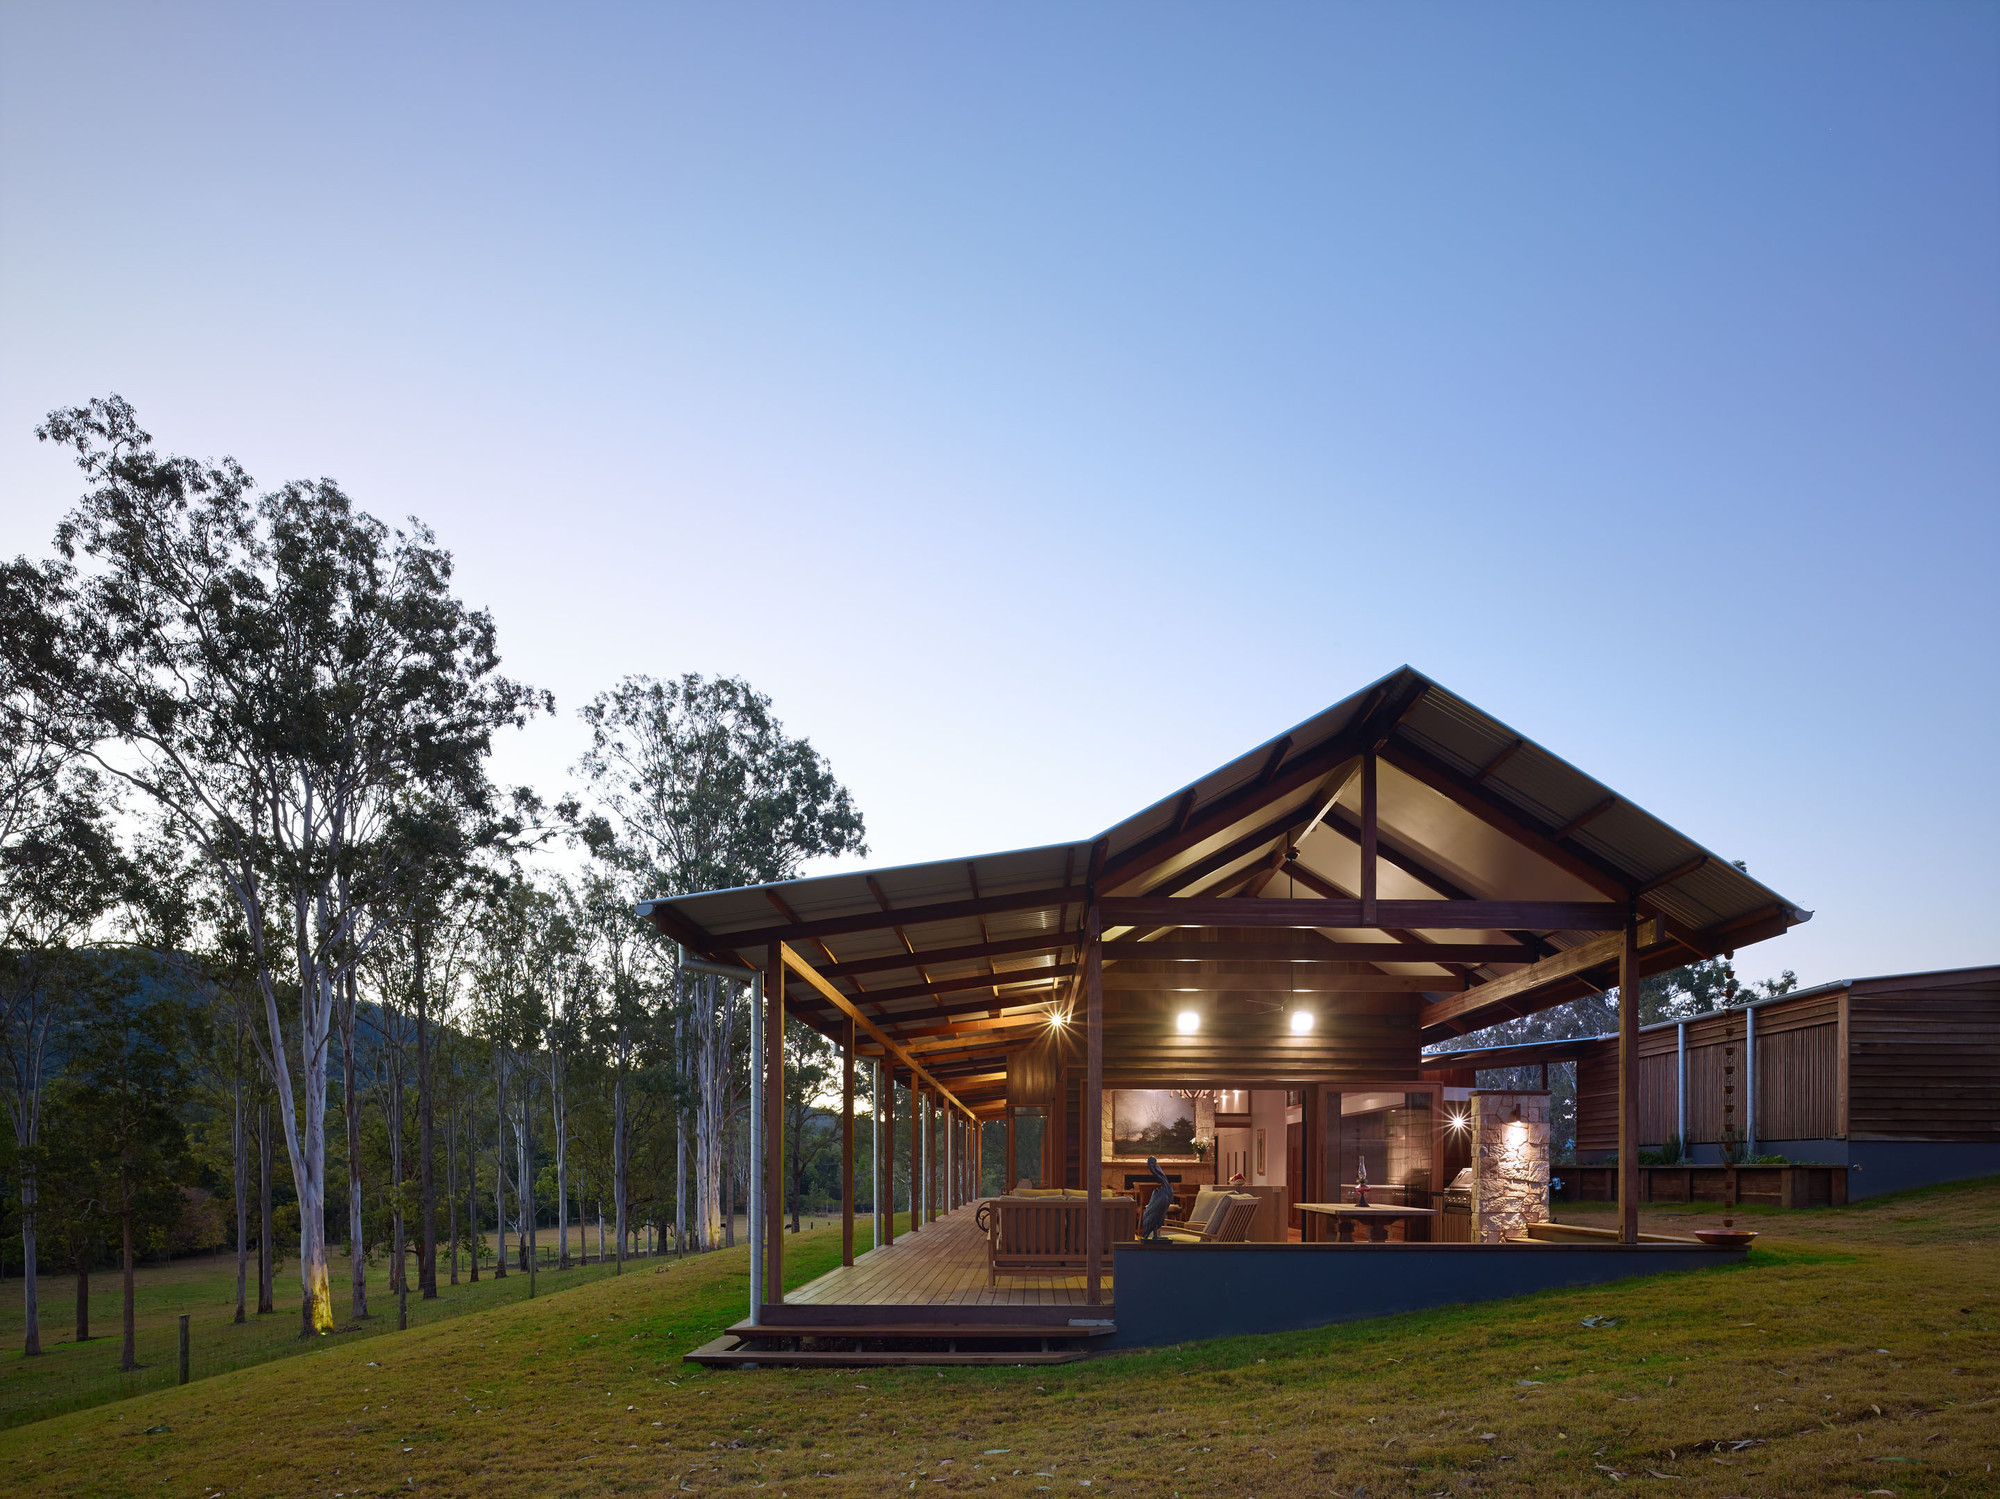 Hinterland House / Shaun Lockyer Architects, © Scott Burrows Photography